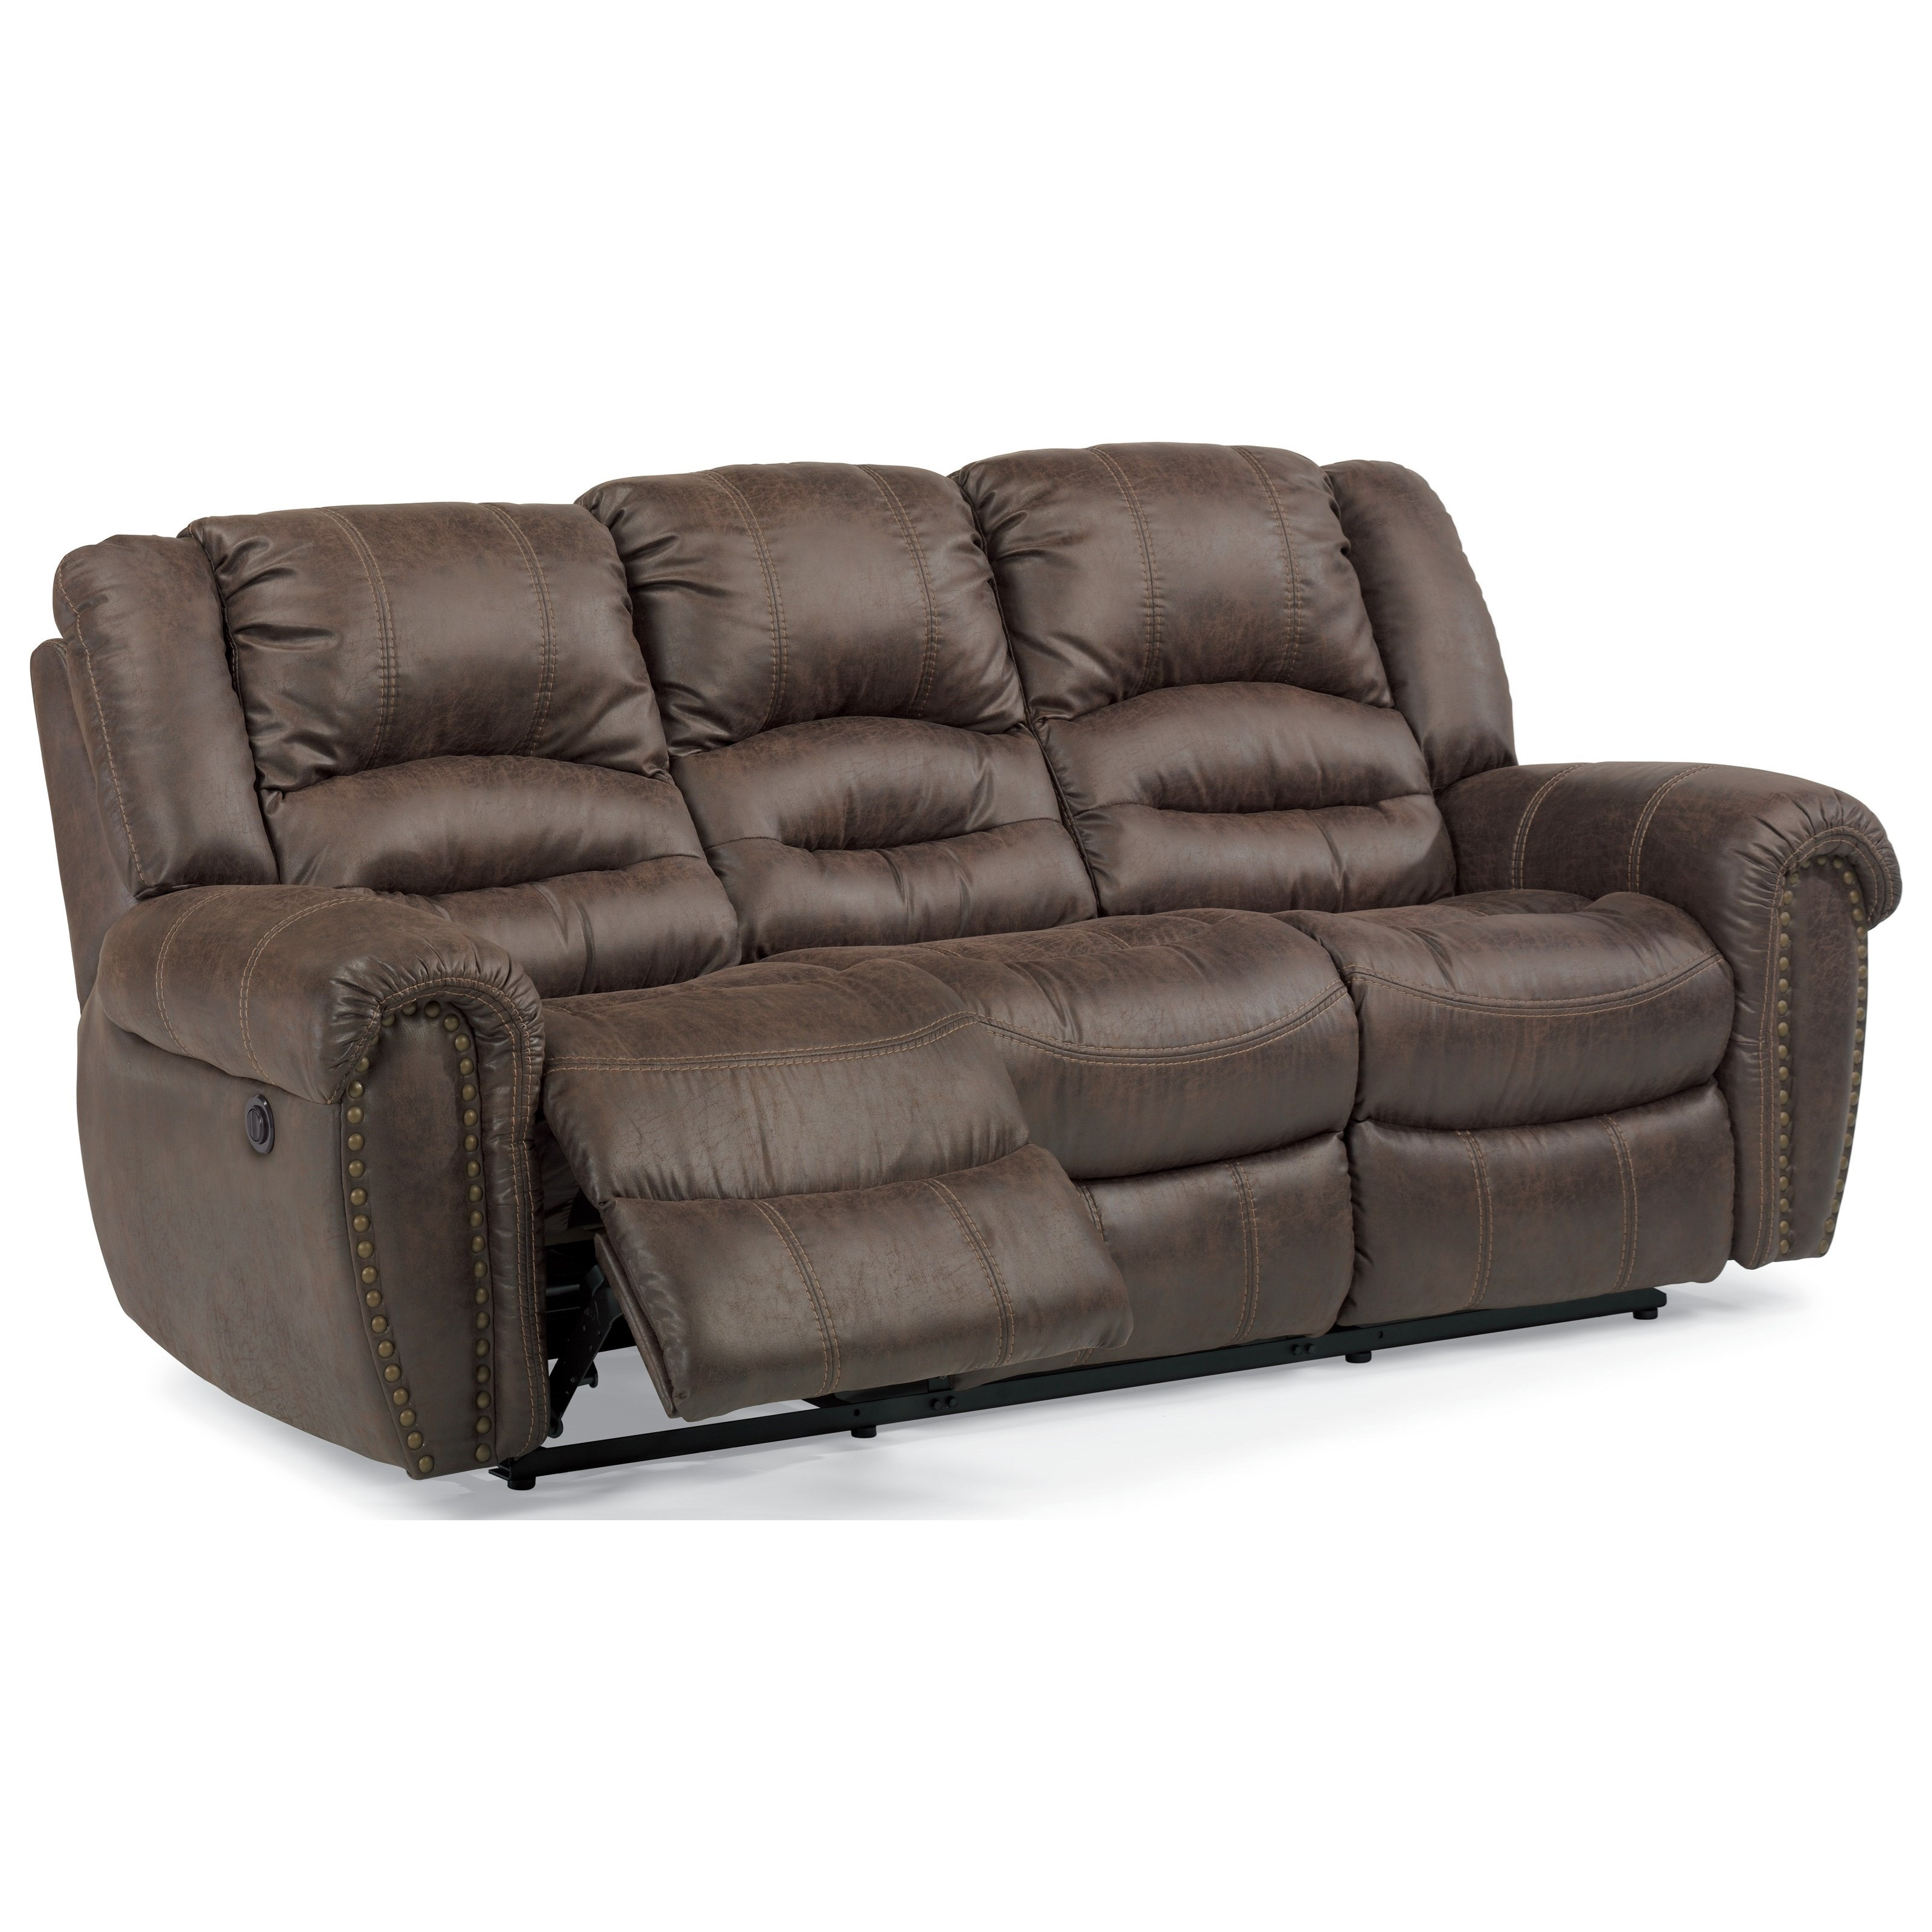 Latitudes - Town Power Reclining Sofa by Flexsteel at Walker's Furniture